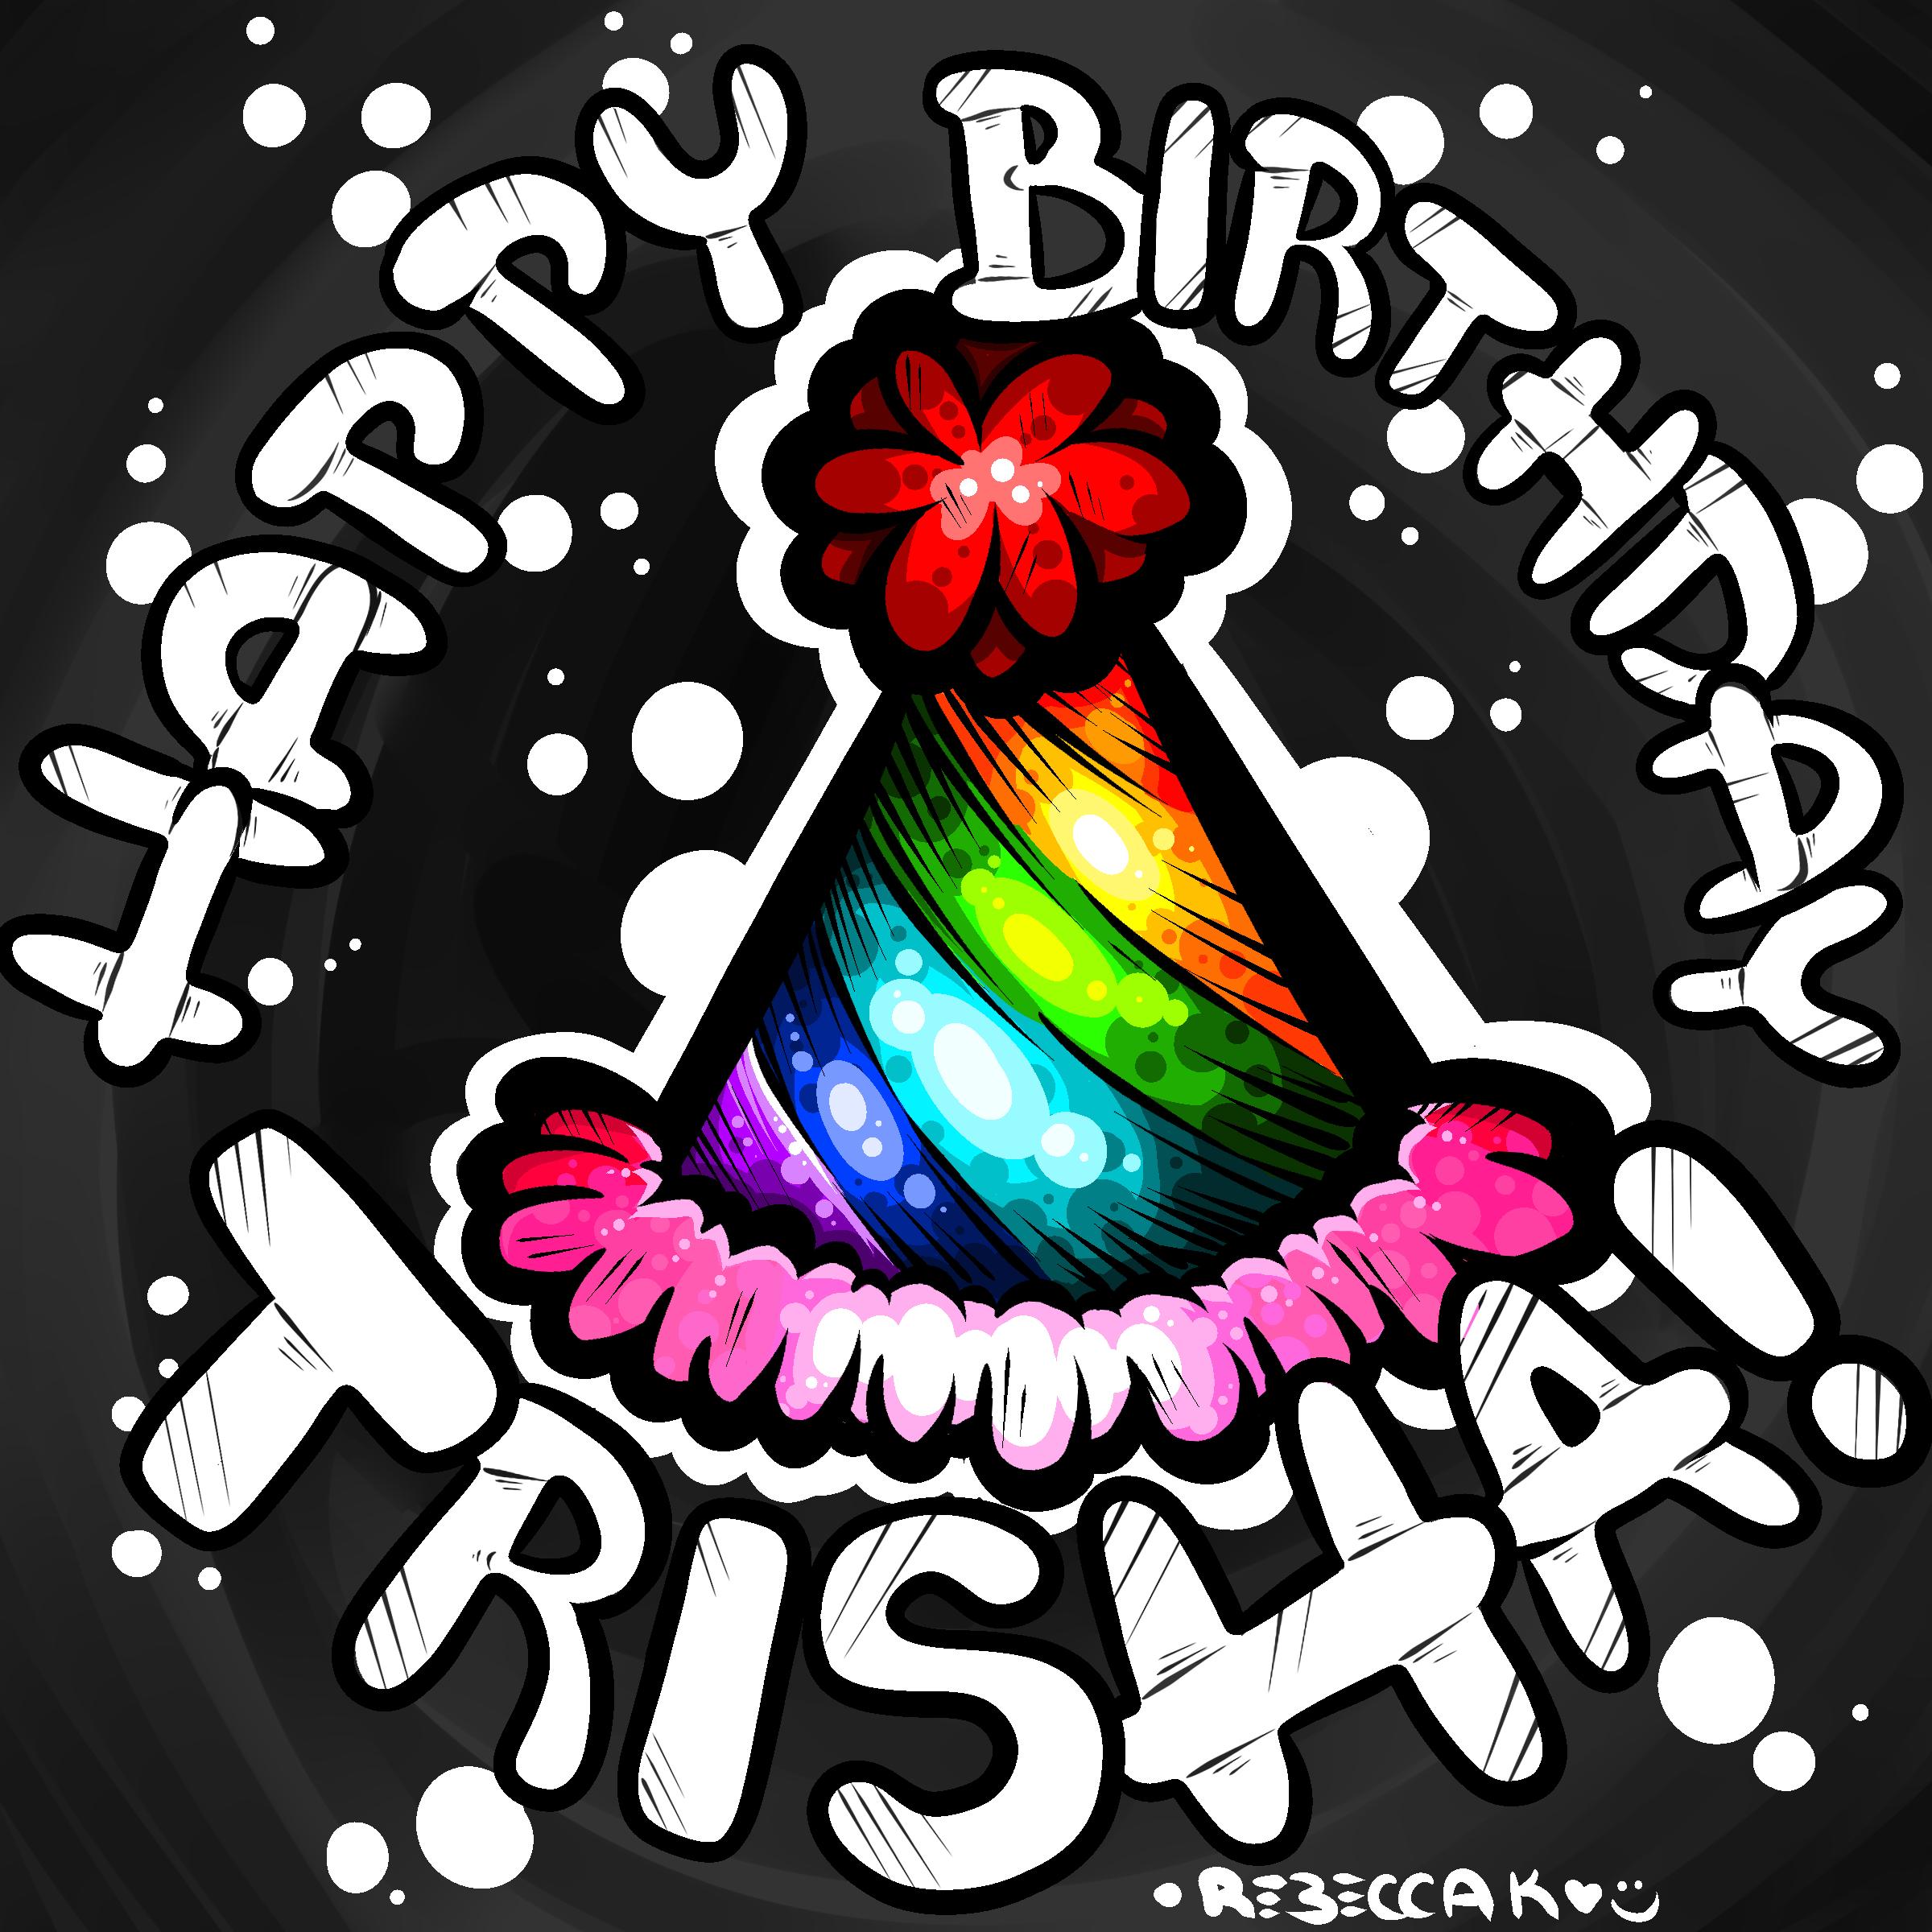 Happy Birthday Trisha by BeKoe on Newgrounds